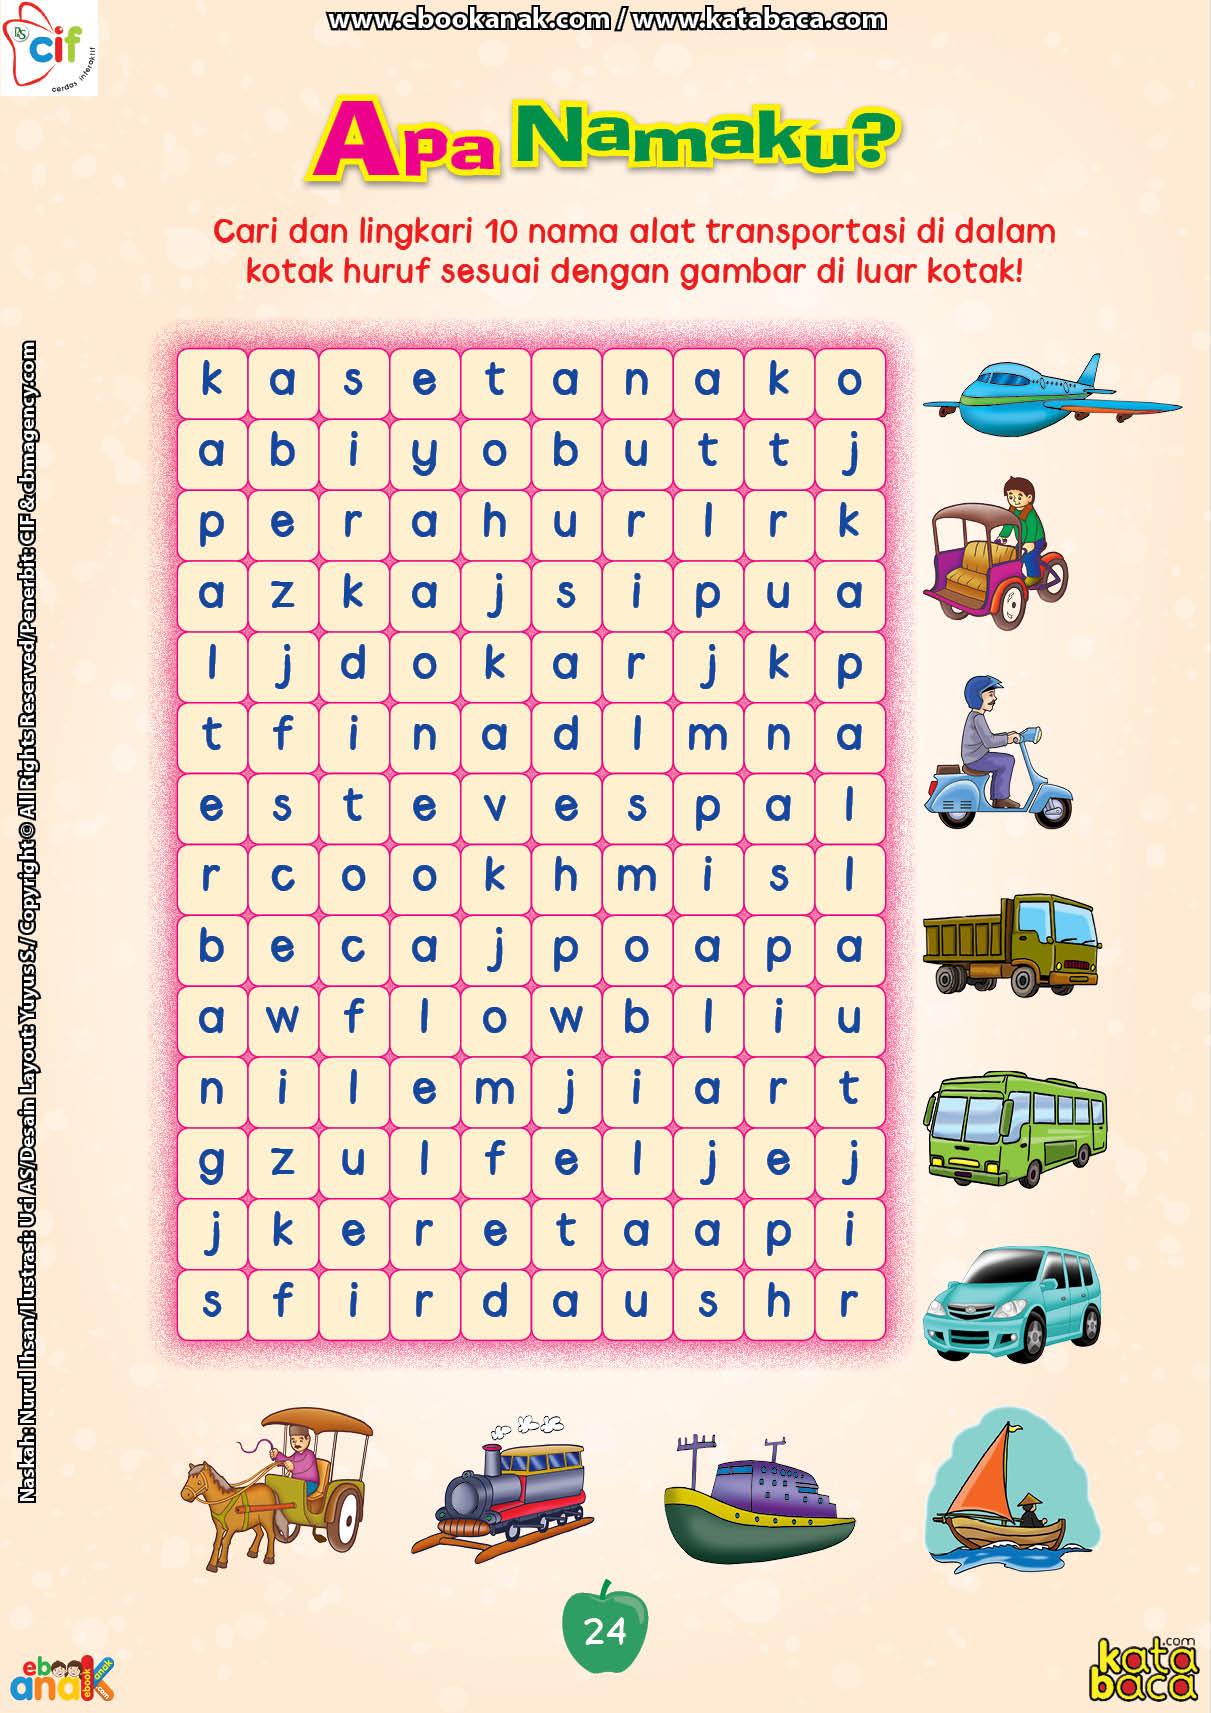 baca buku online brain games calistung24 Mencari dan Melingkari Nama-Nama Alat Transportasi